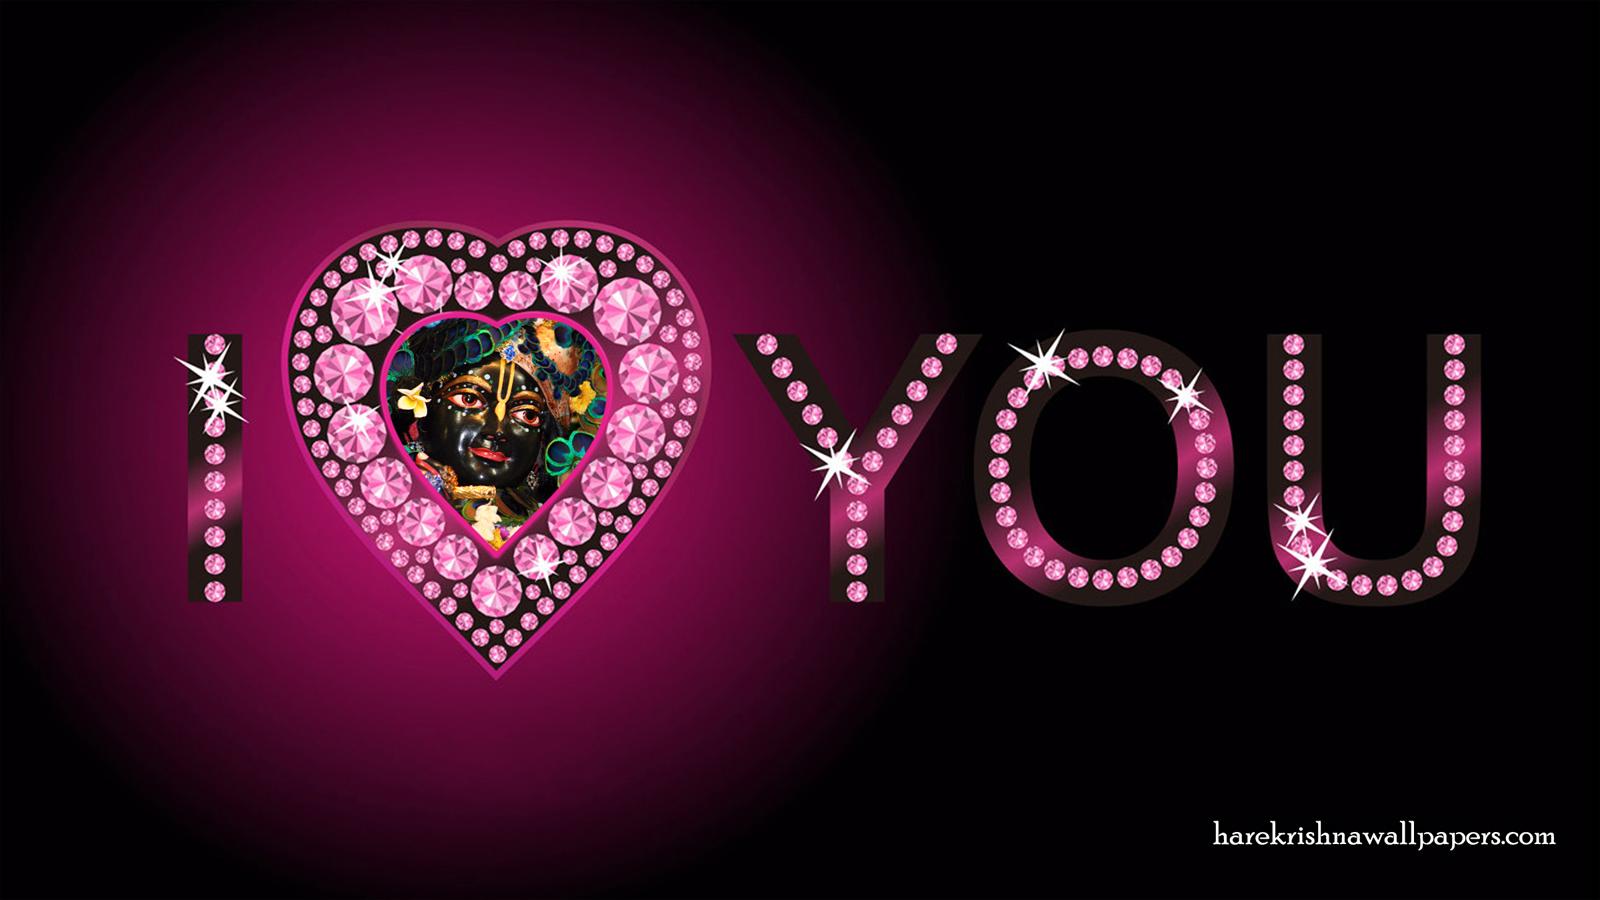 I Love You Shyamsundar Wallpaper (003) Size 1600x900 Download